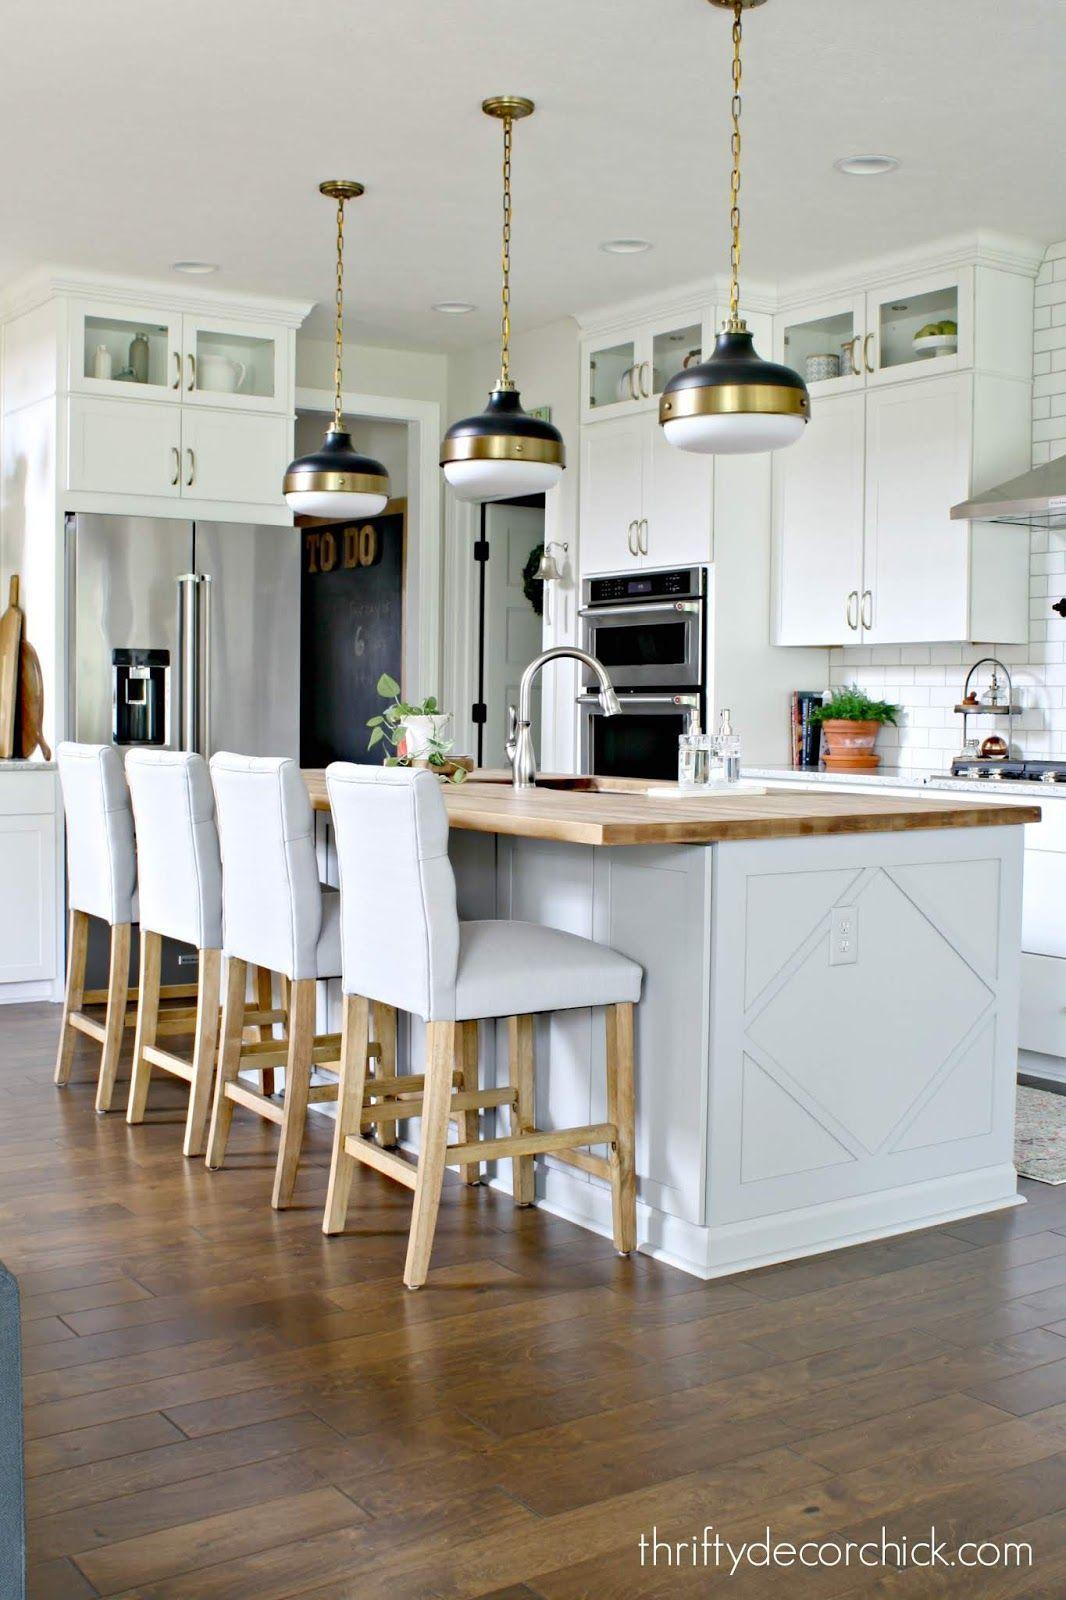 Modern Farmhouse Kitchen With Light Gray Island And White Cabinets Diykitchenisland White Modern Kitchen Dream Kitchens Design Kitchen Design